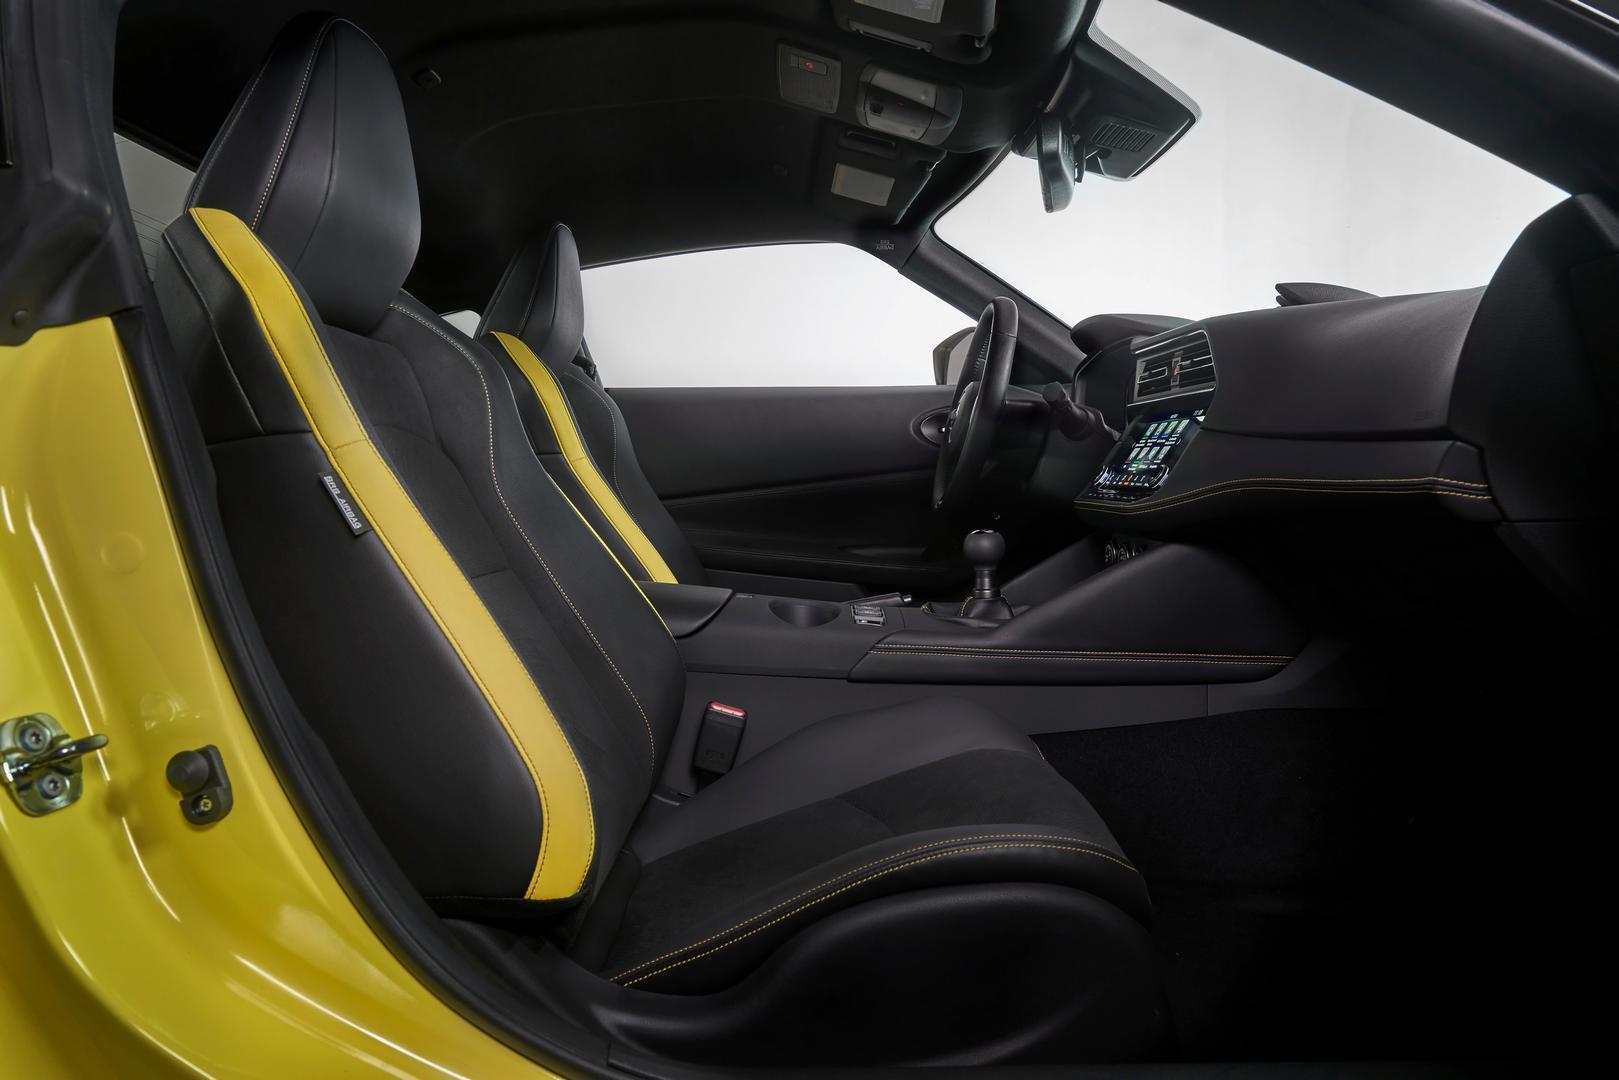 2022 Nissan Z Proto interior